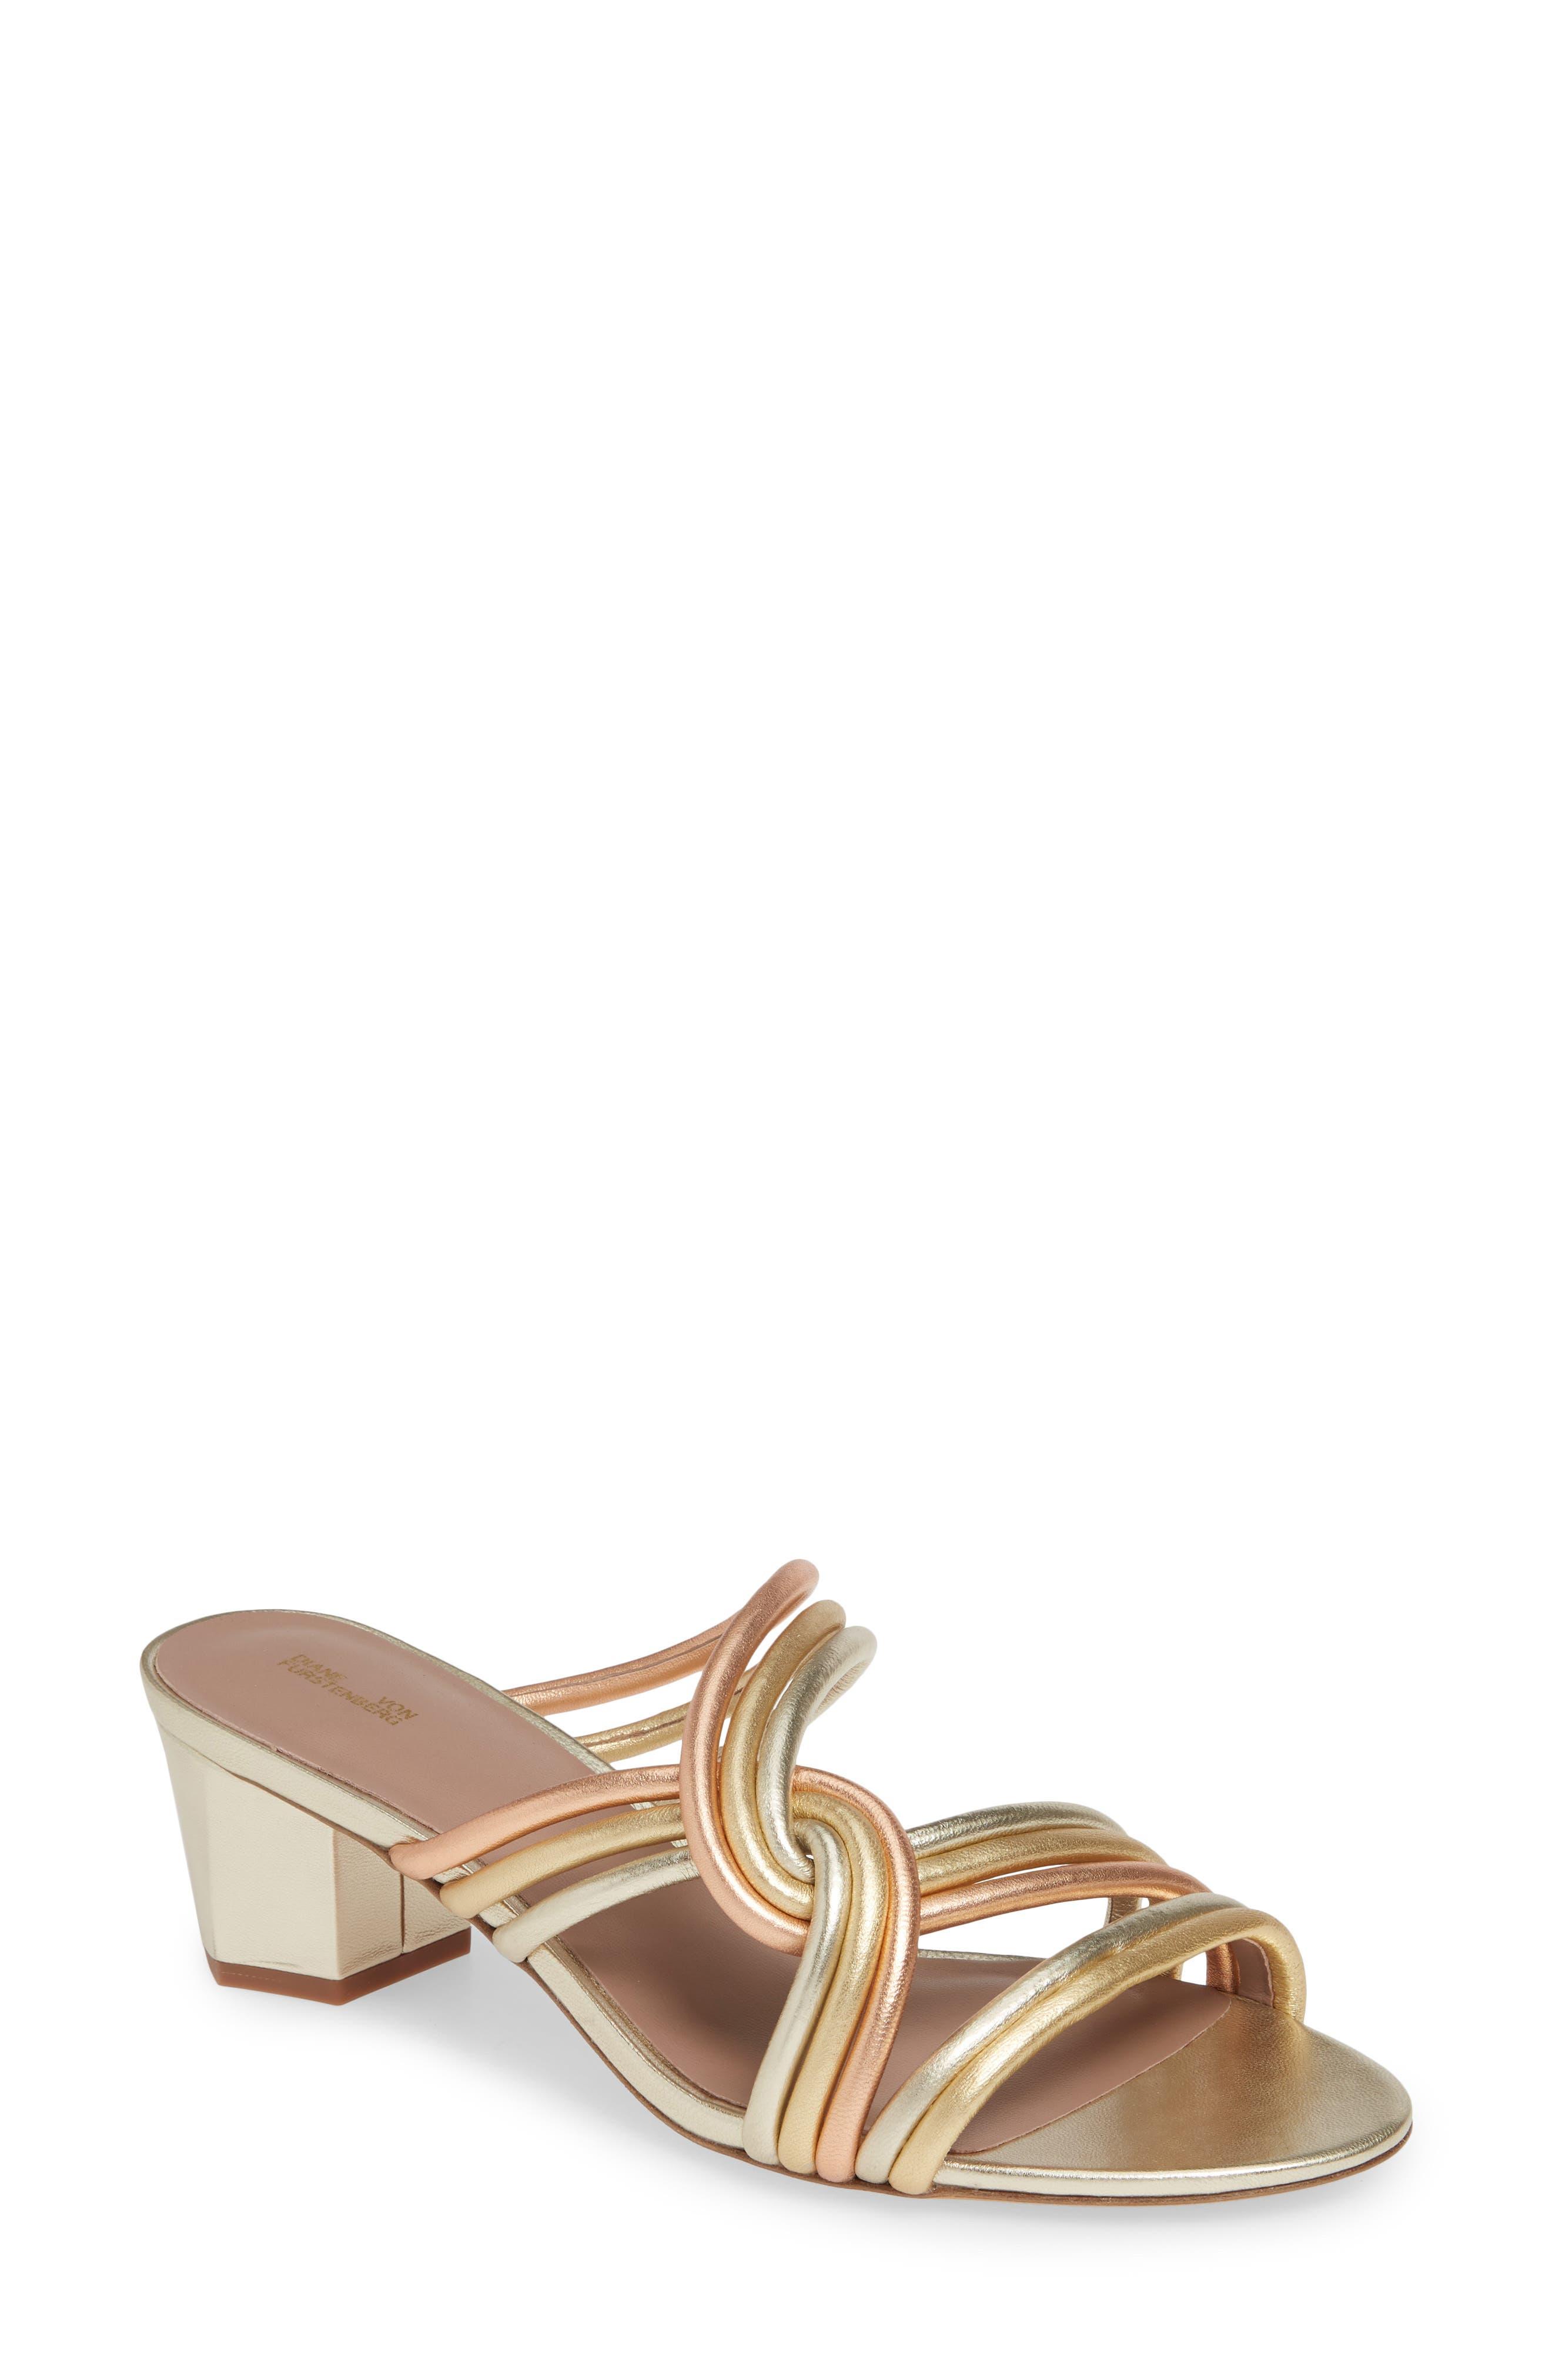 Diane Von Furstenberg Jada Sandal, Metallic